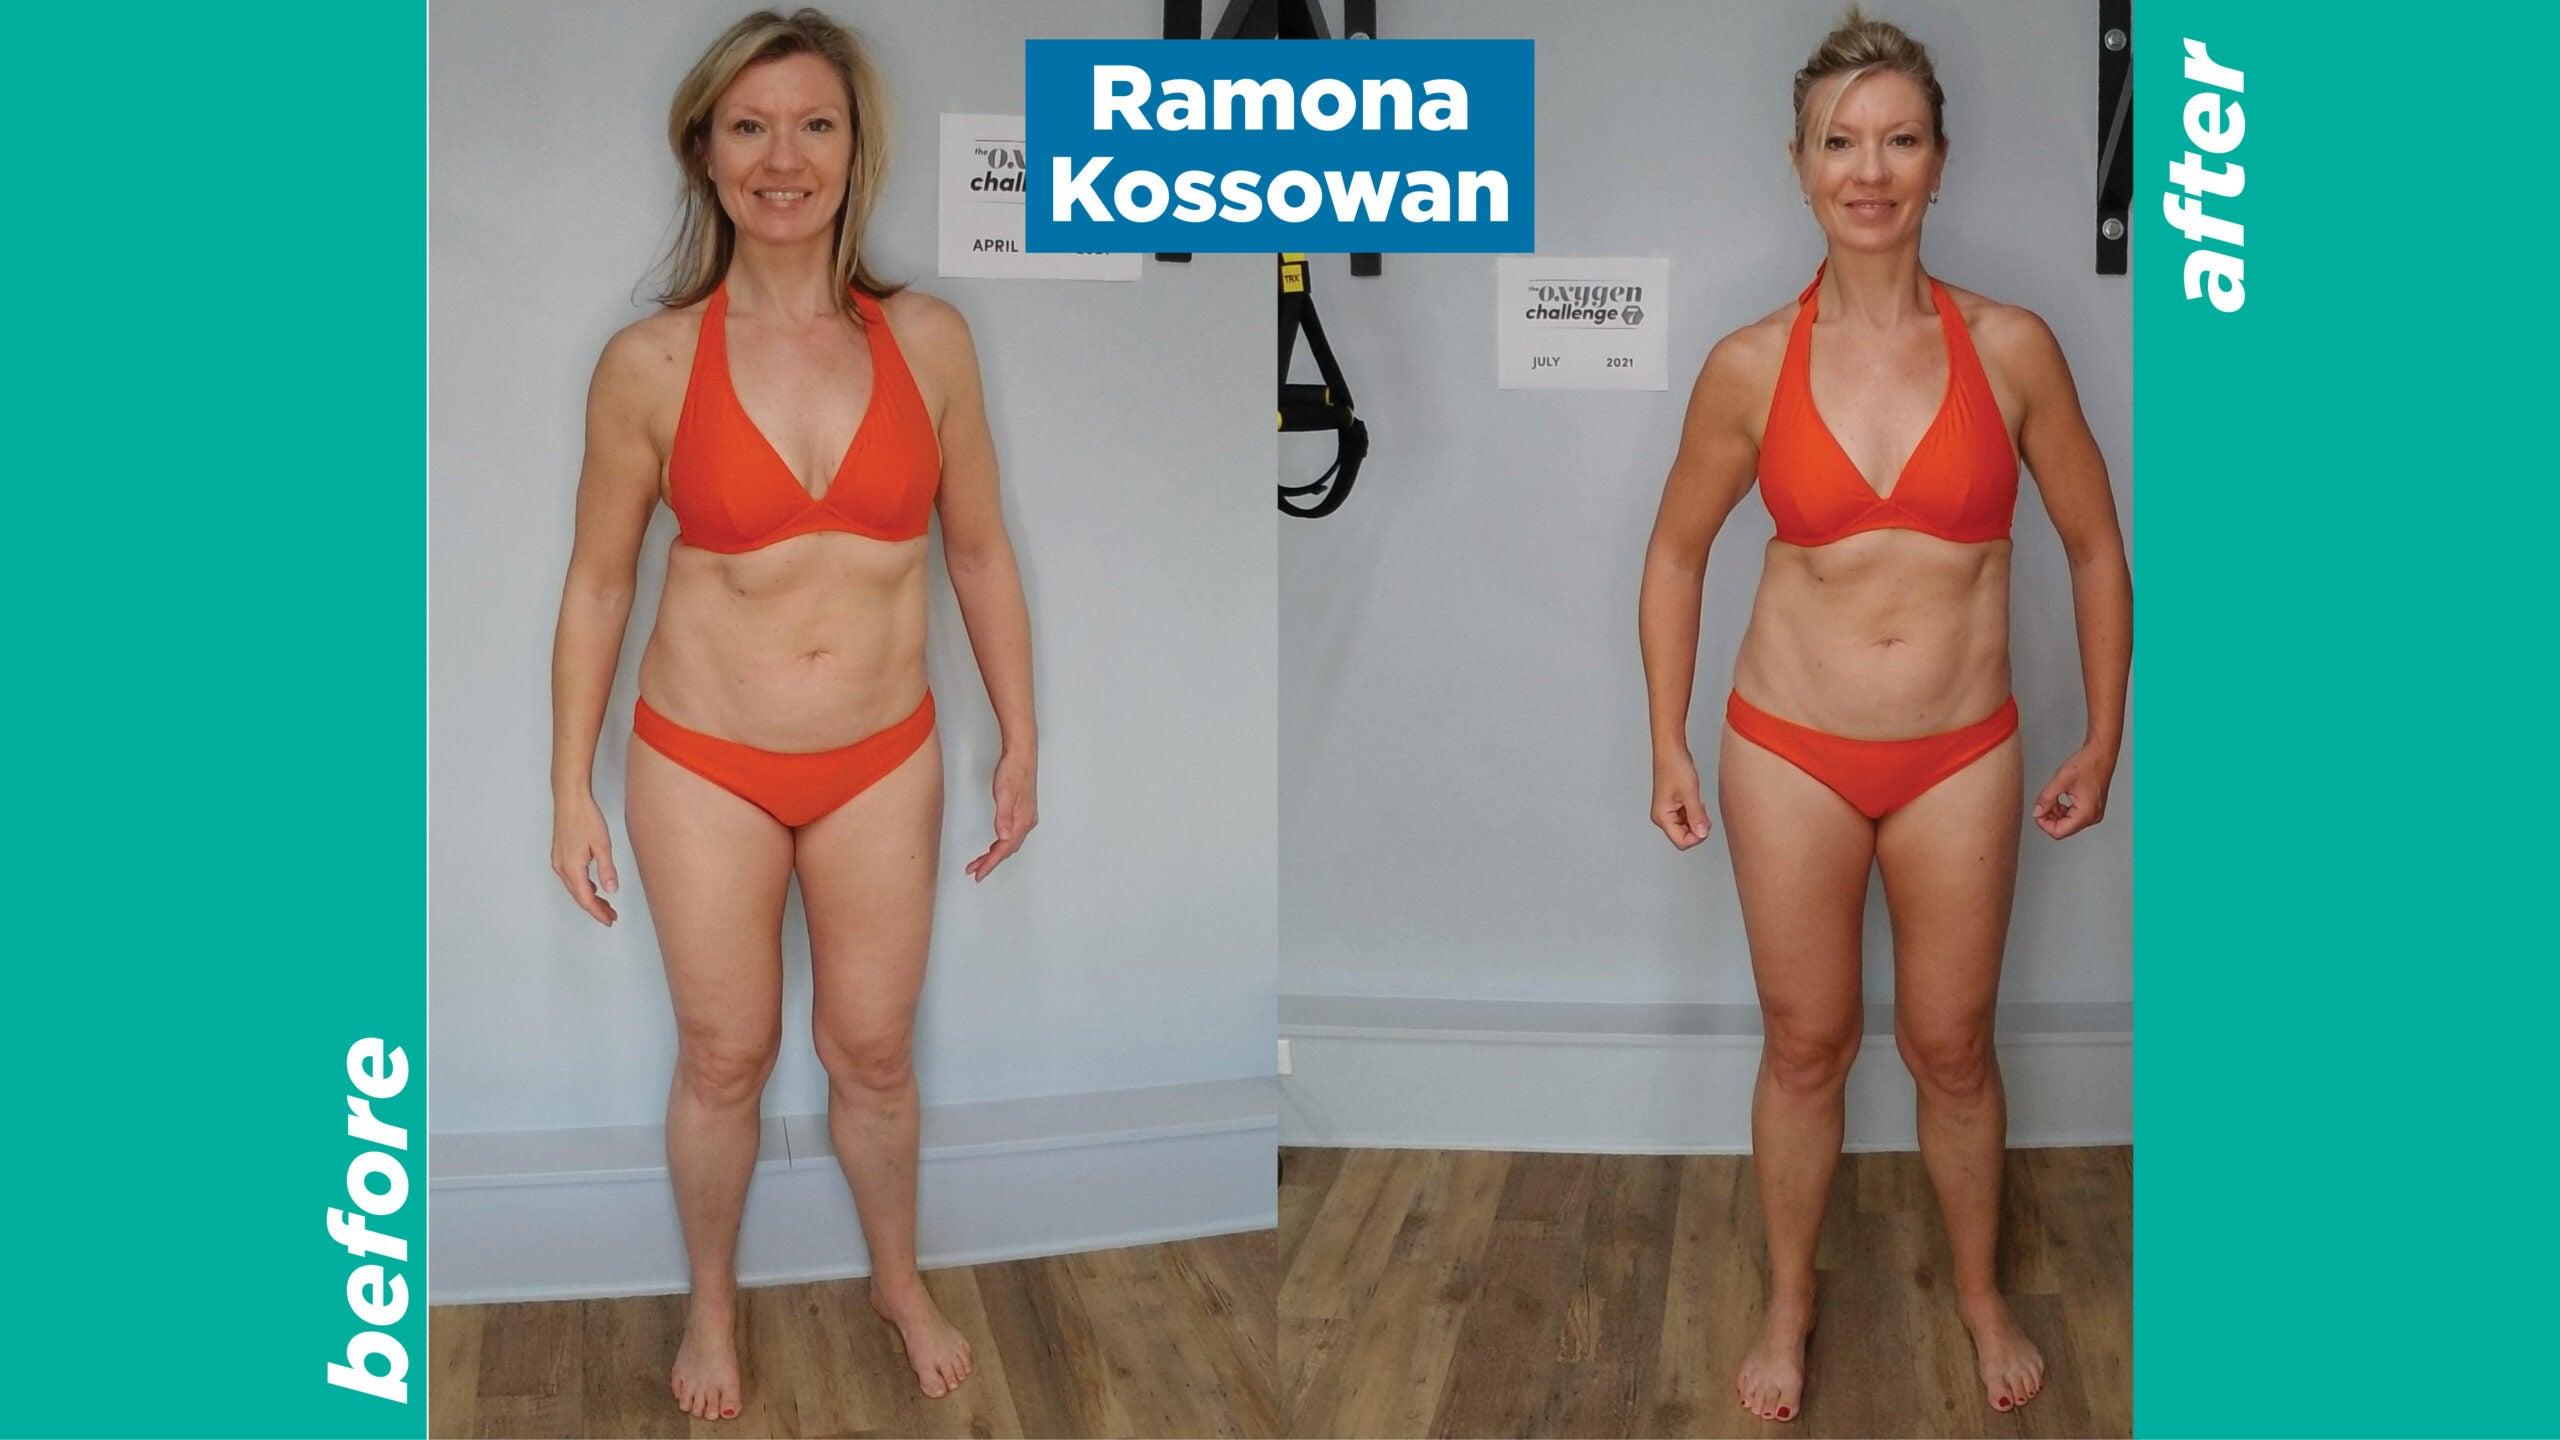 Ramona Kossowan 2